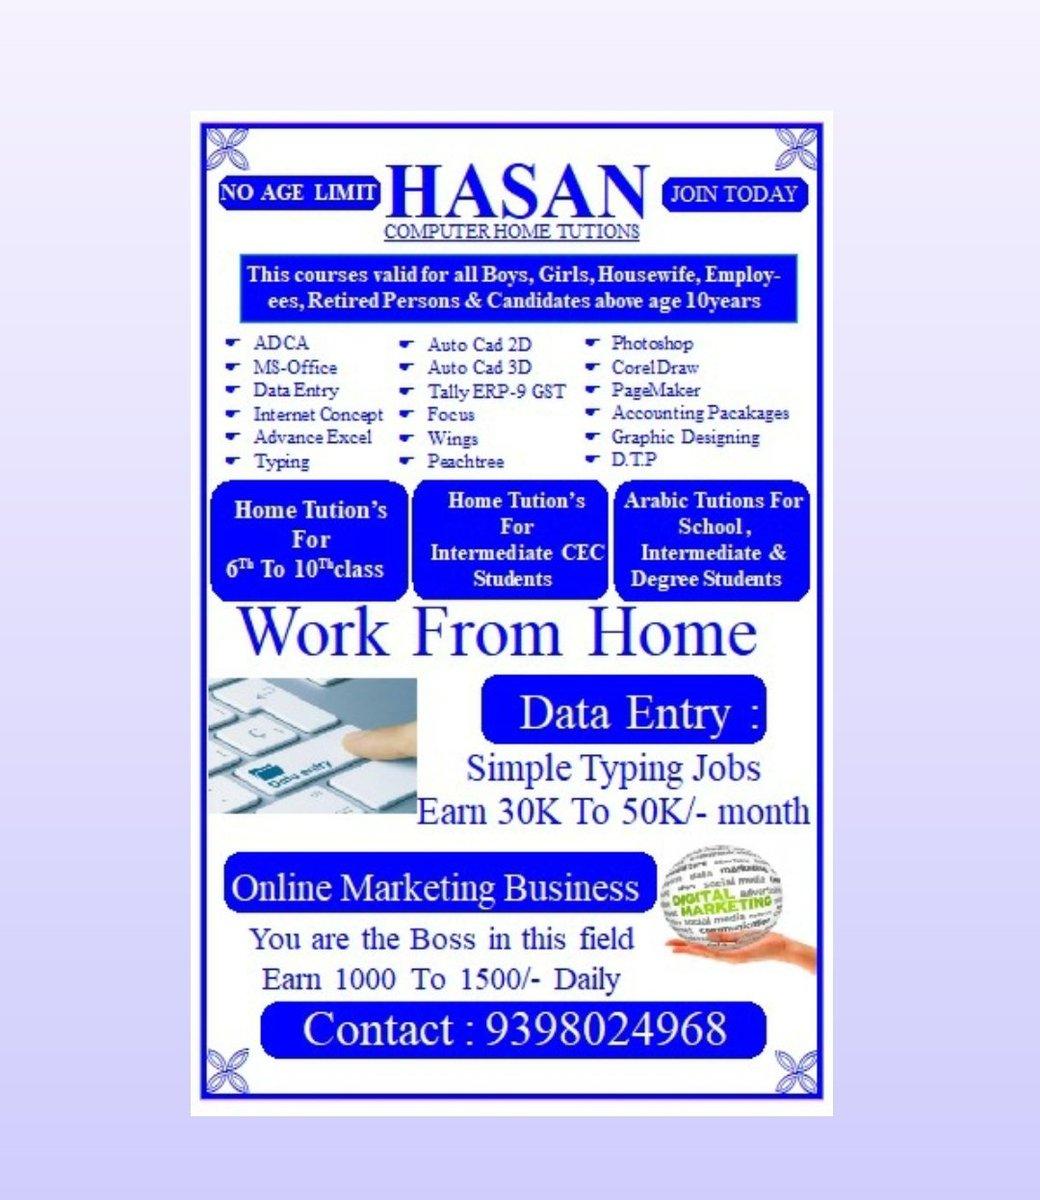 #hometutions #Twitter #Google #education #COURSES #computer #Hyderabad #Telangana #India #Tweet #retweet #earn #stylish__hasan @stylish__Hasan https://t.co/xdGrkEtTuO